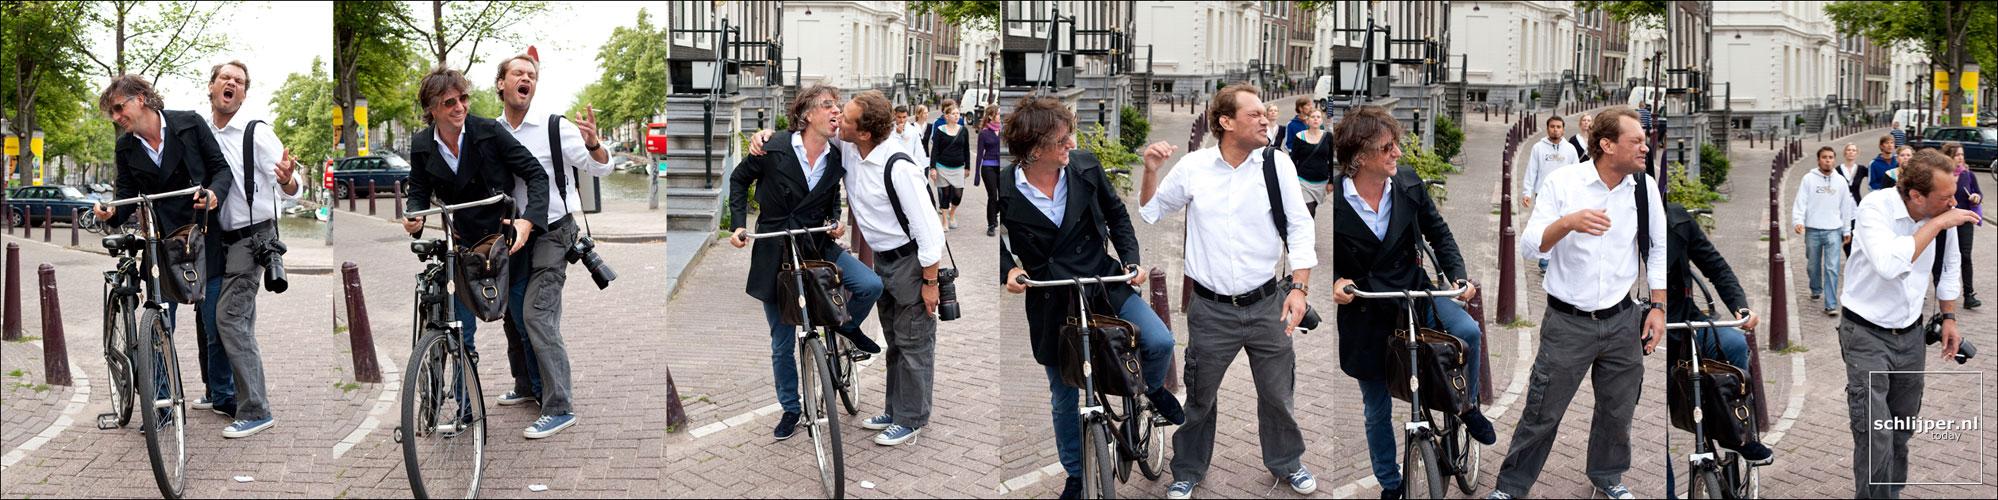 Nederland, Amsterdam, 19 juli 2009